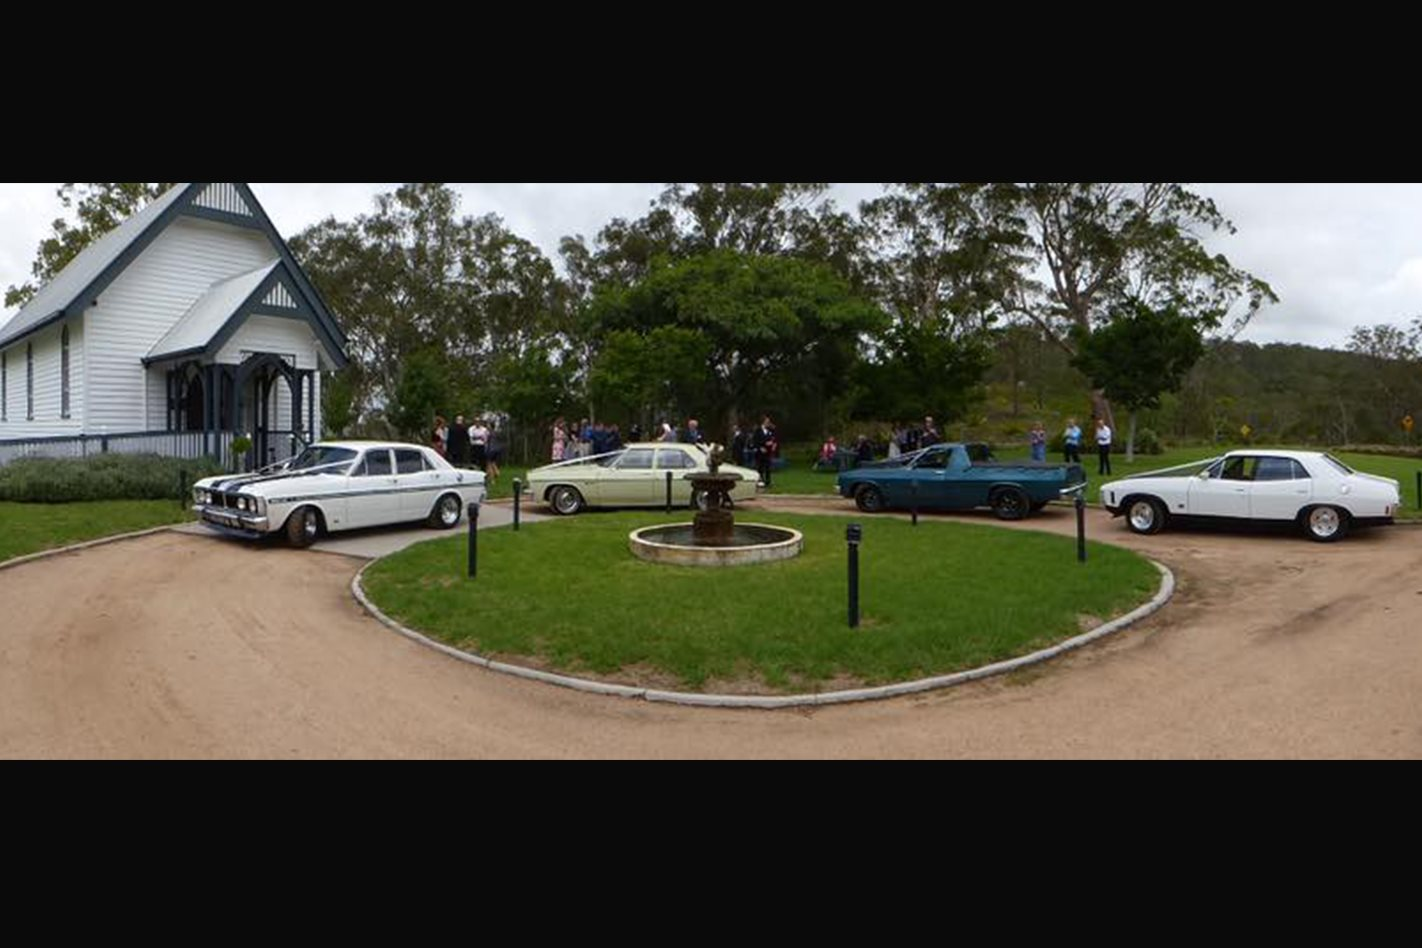 James Turner's wedding cars